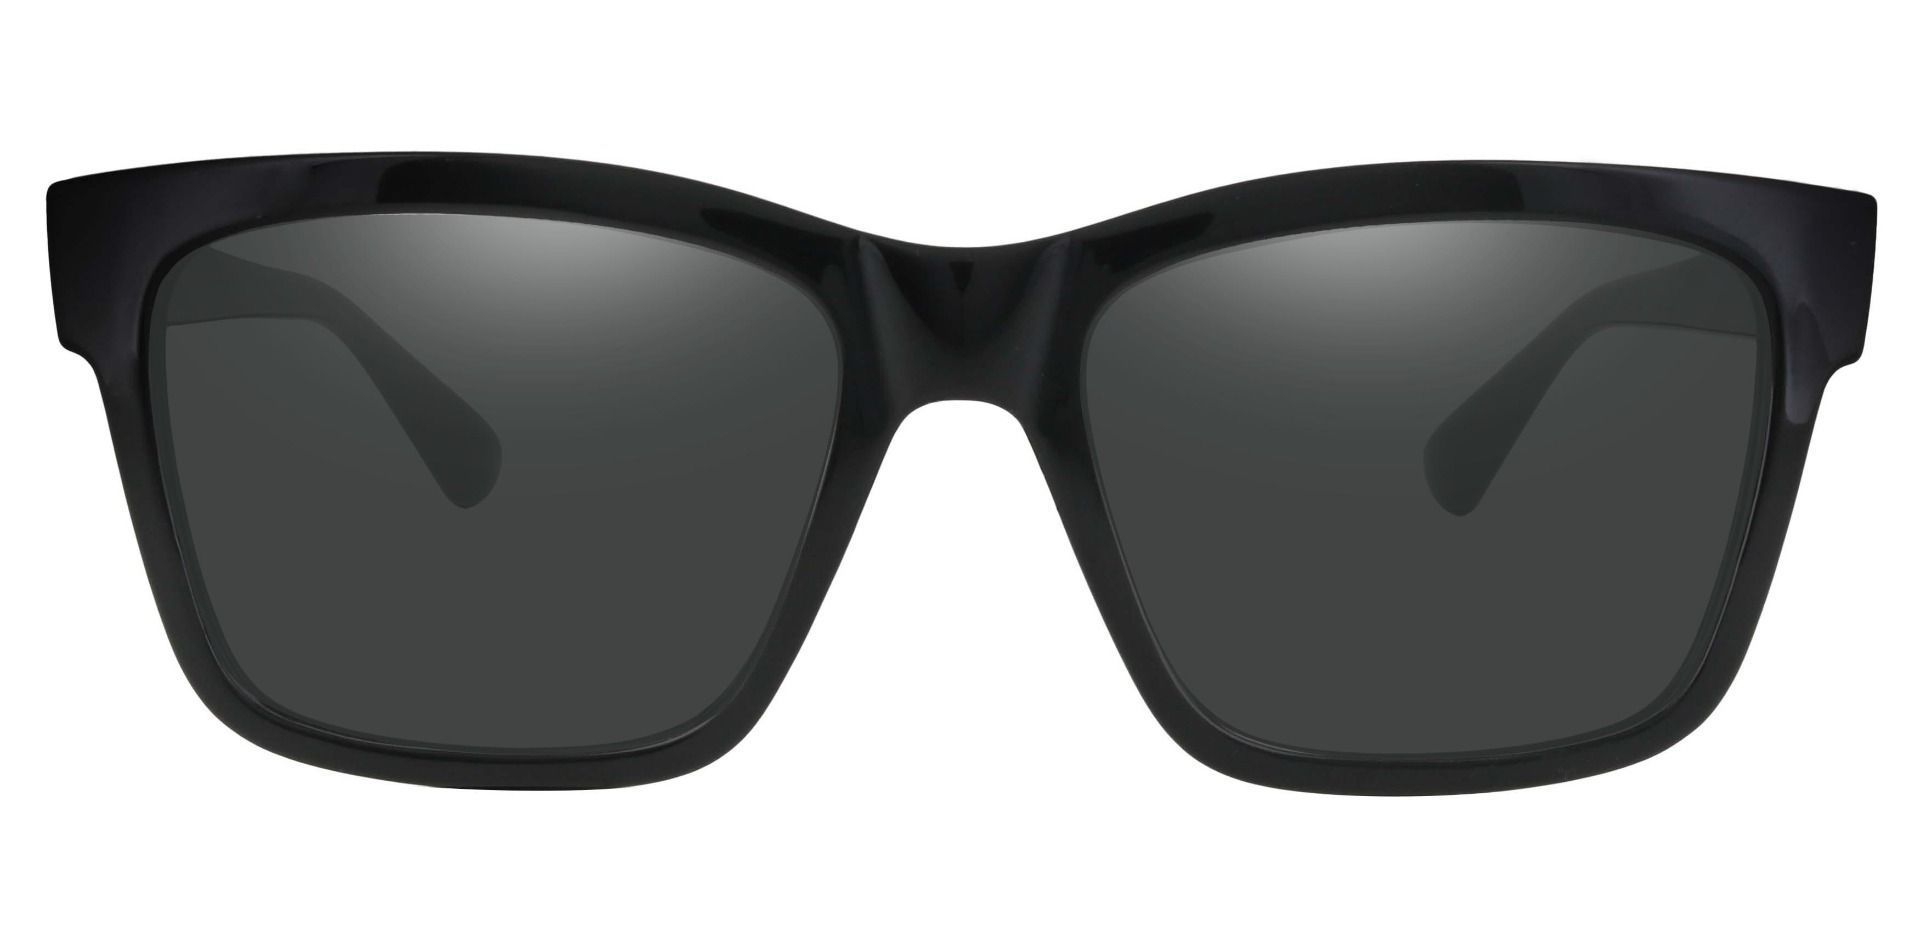 Brinley Square Reading Sunglasses - Black Frame With Gray Lenses